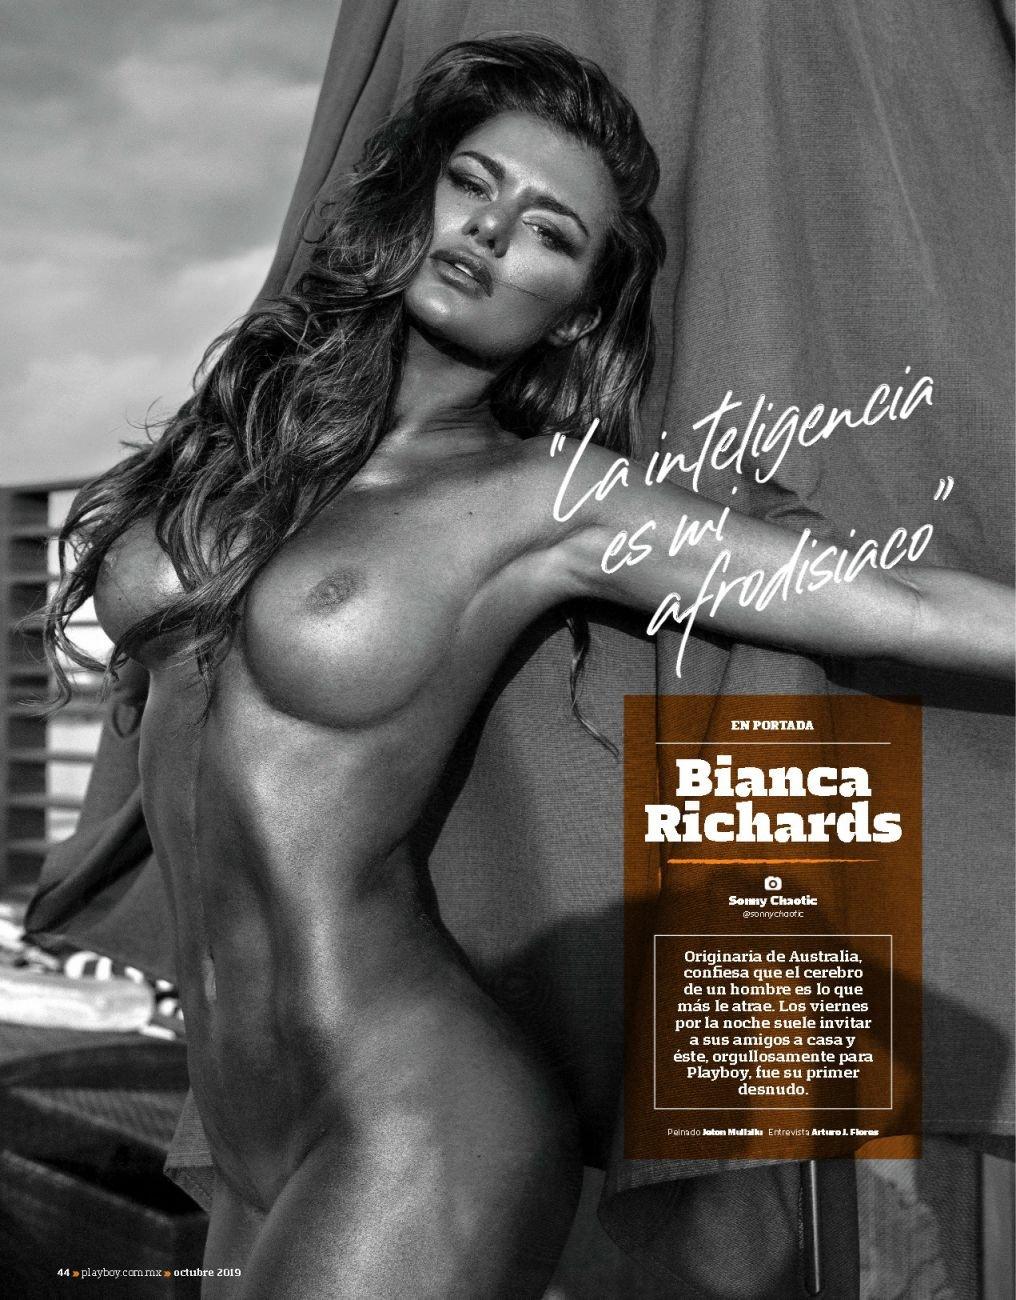 Andrea García Al Desnudo bianca richards nude (5 photos) – ( ͡° ͜ʖ ͡°) |the fappening